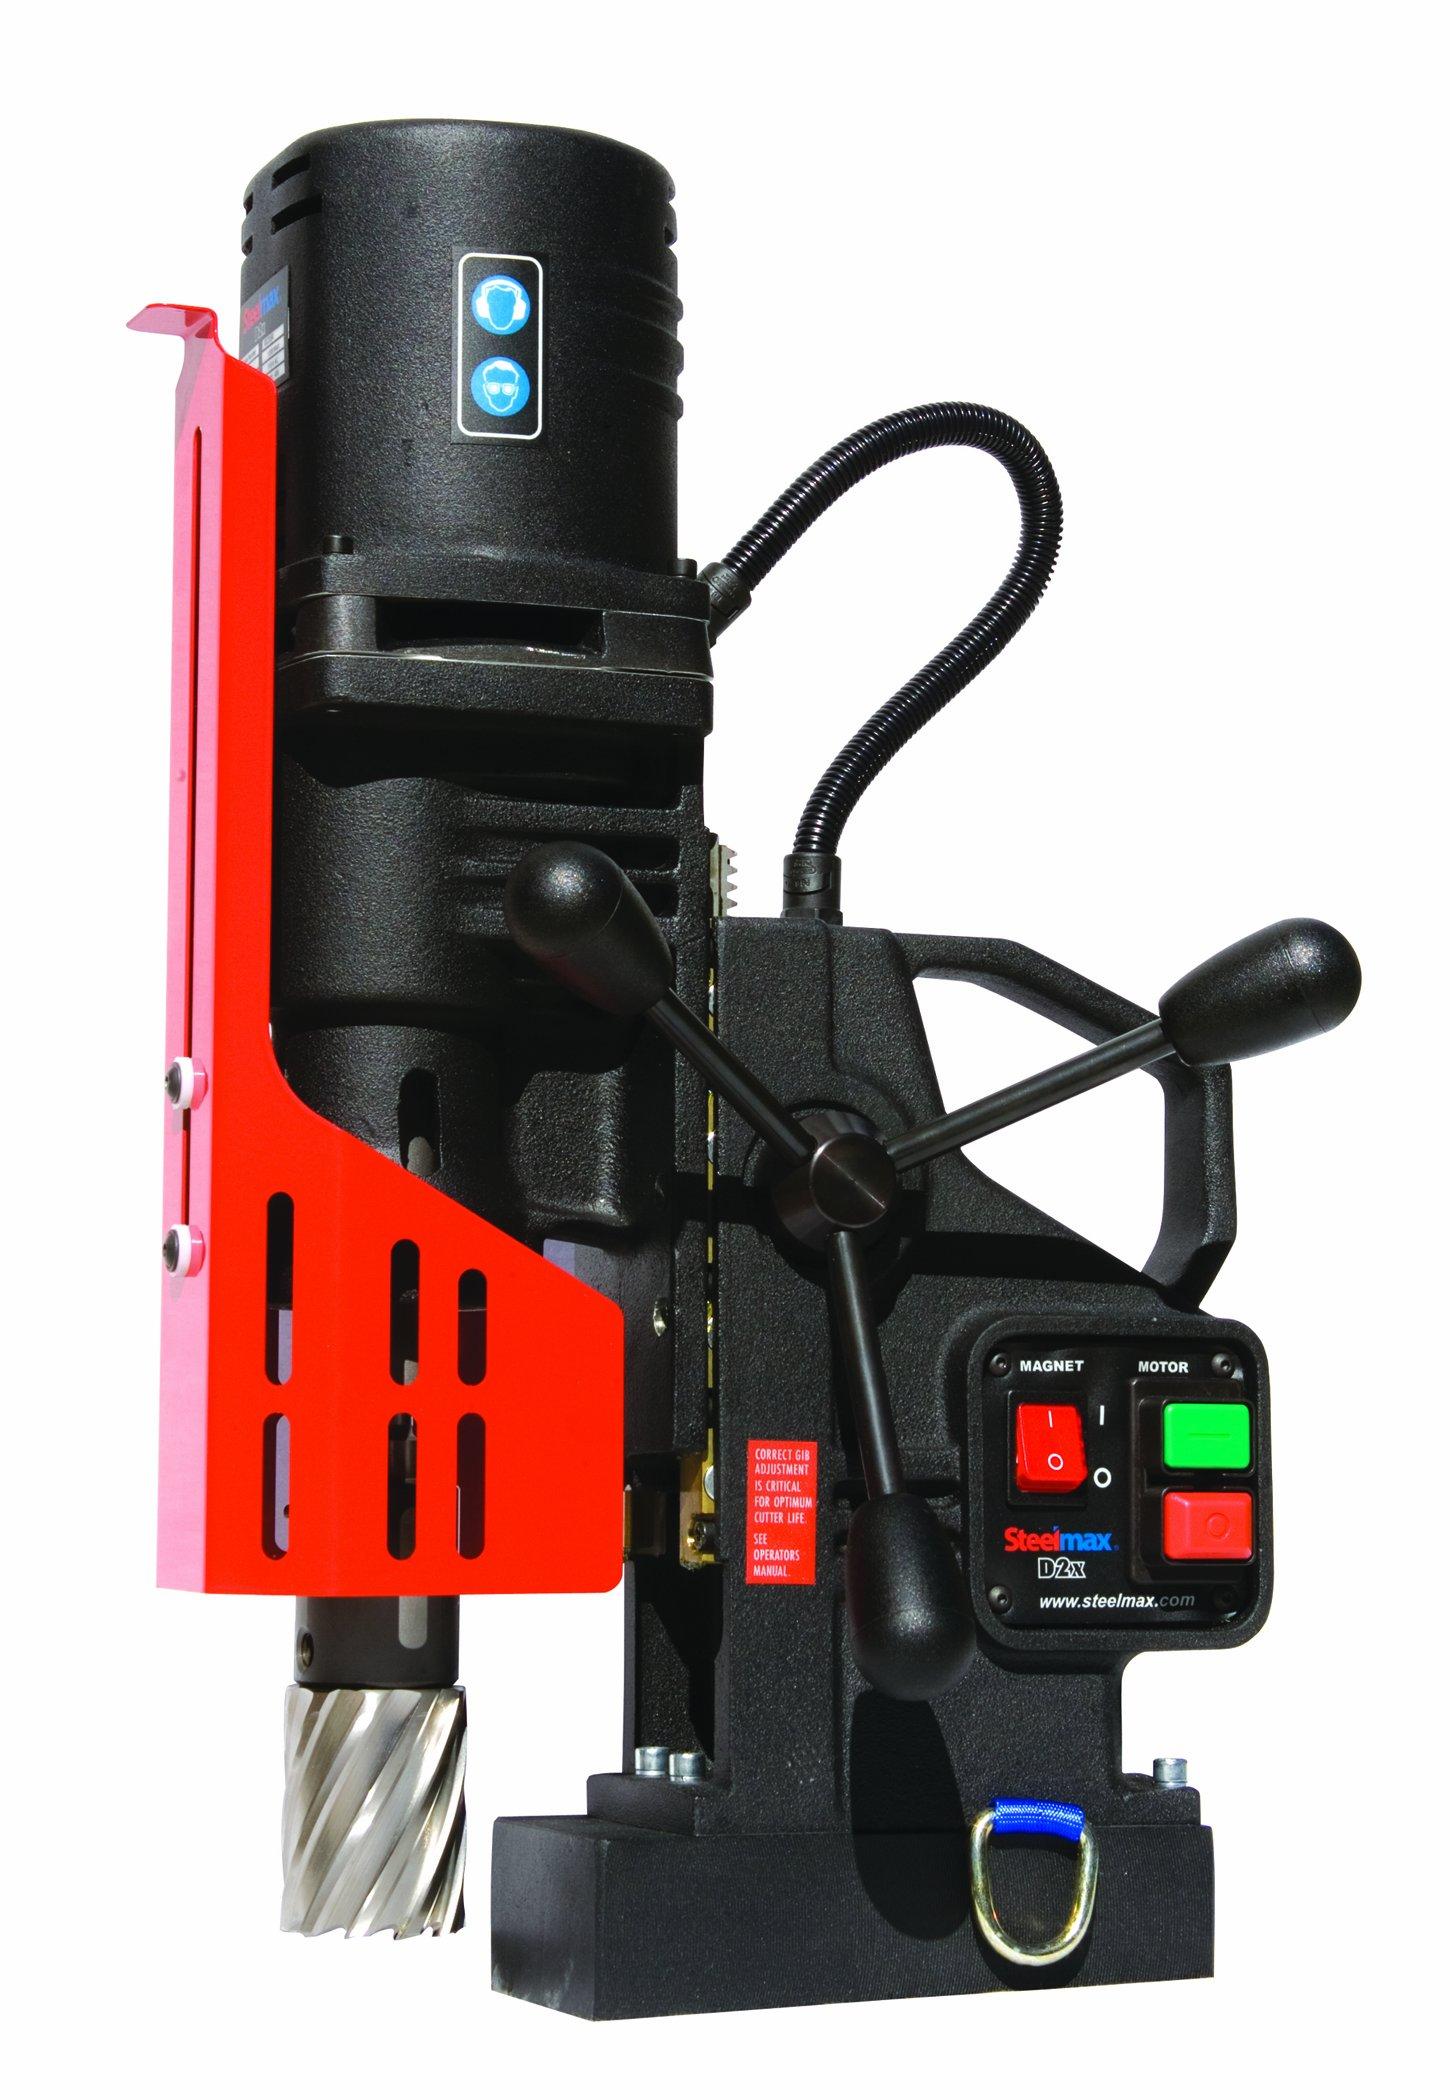 Steelmax SM-D2X Portable Magnetic Drill, 2'' Diameter x 3'' Depth of Cut (Maximums)